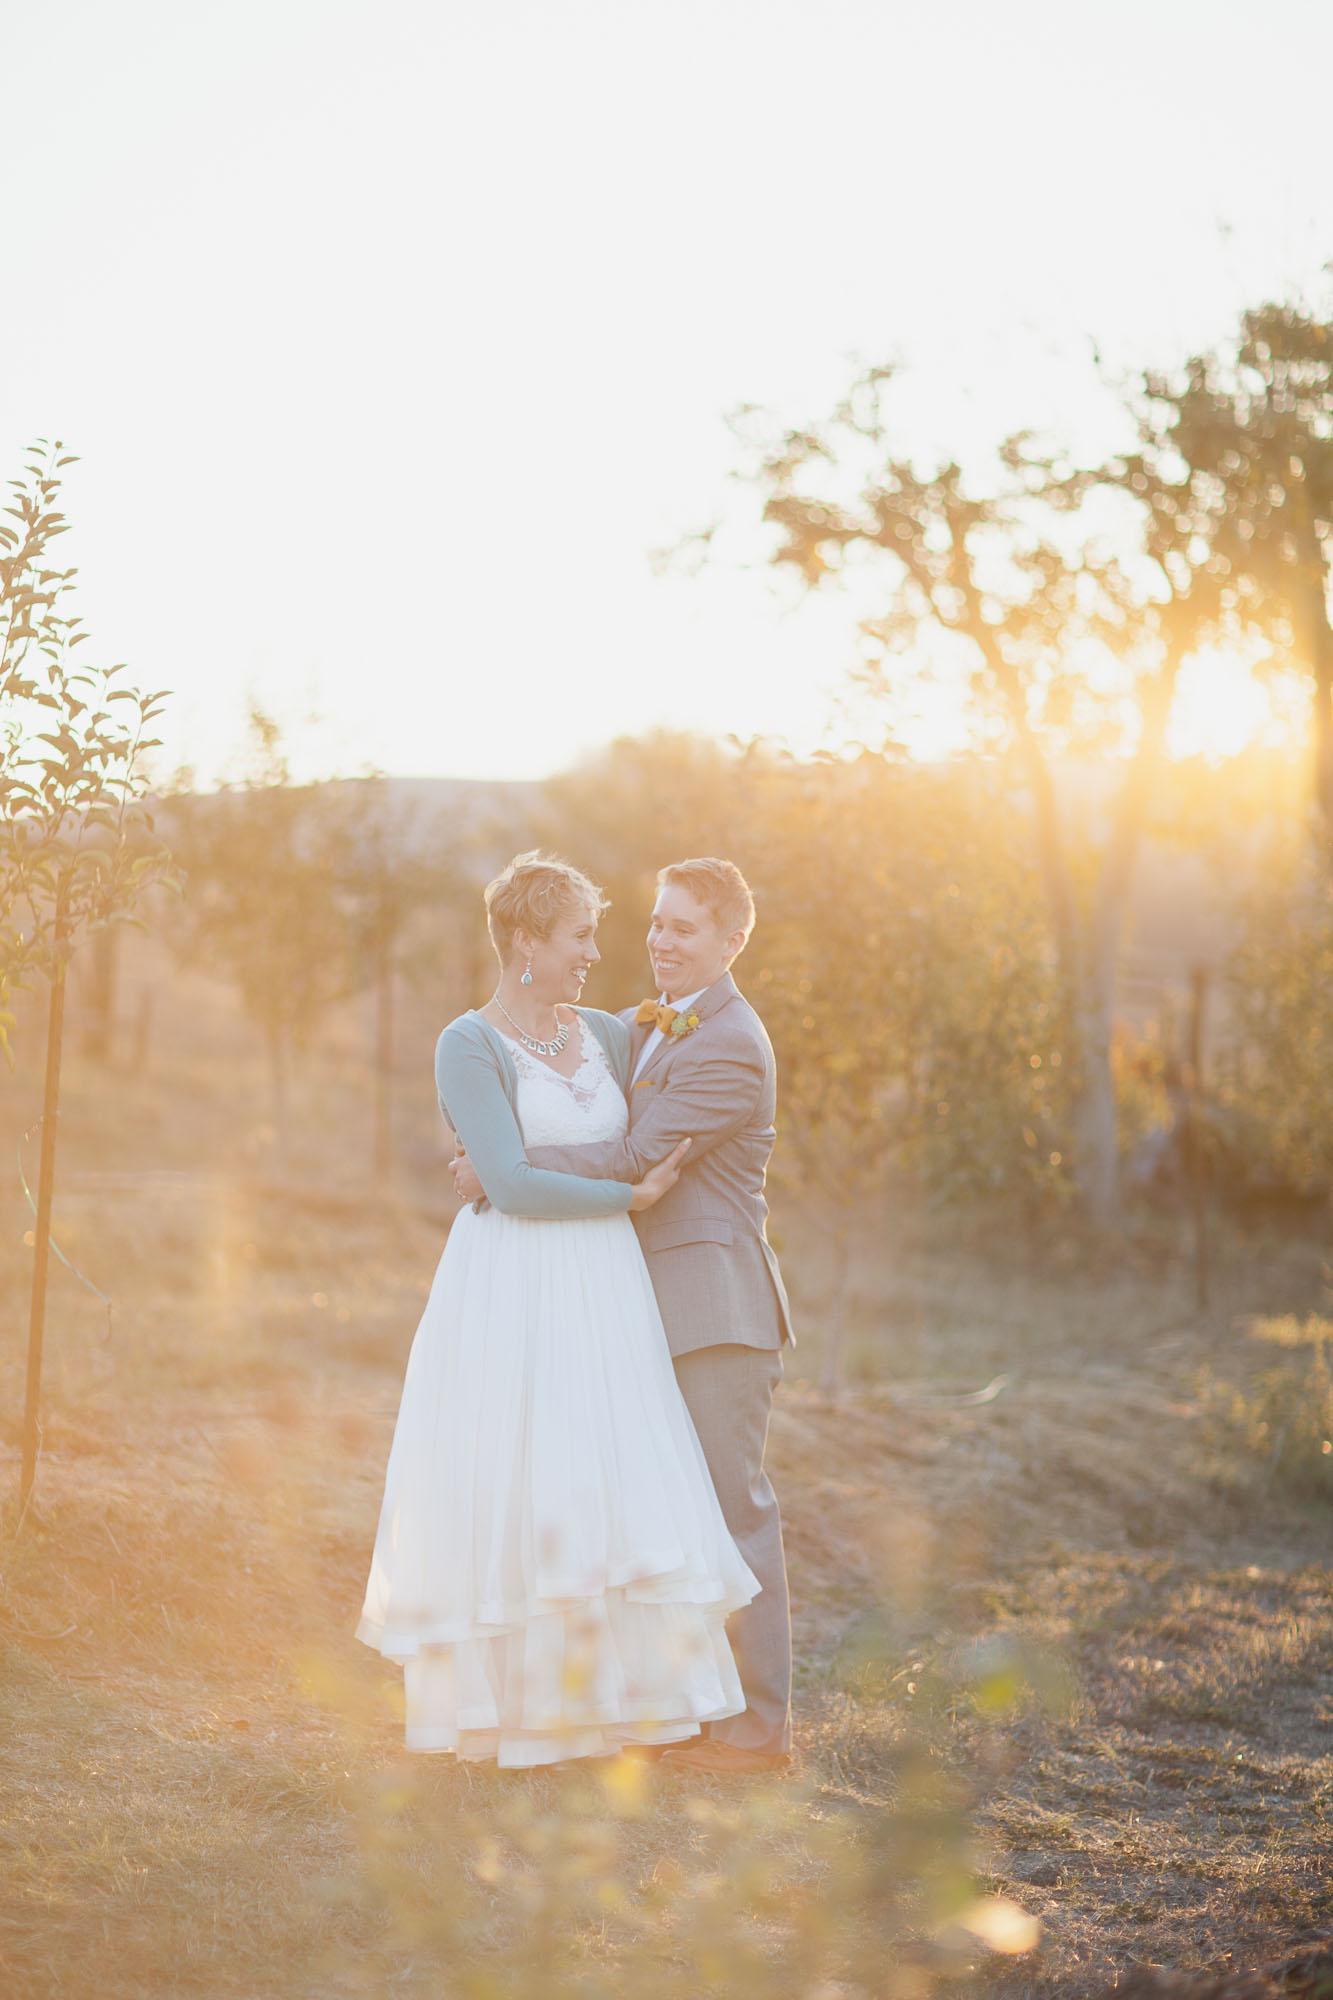 Gretchen_Gause_Petaluma_Olympias_Valley_Wedding_Photo-200.jpg